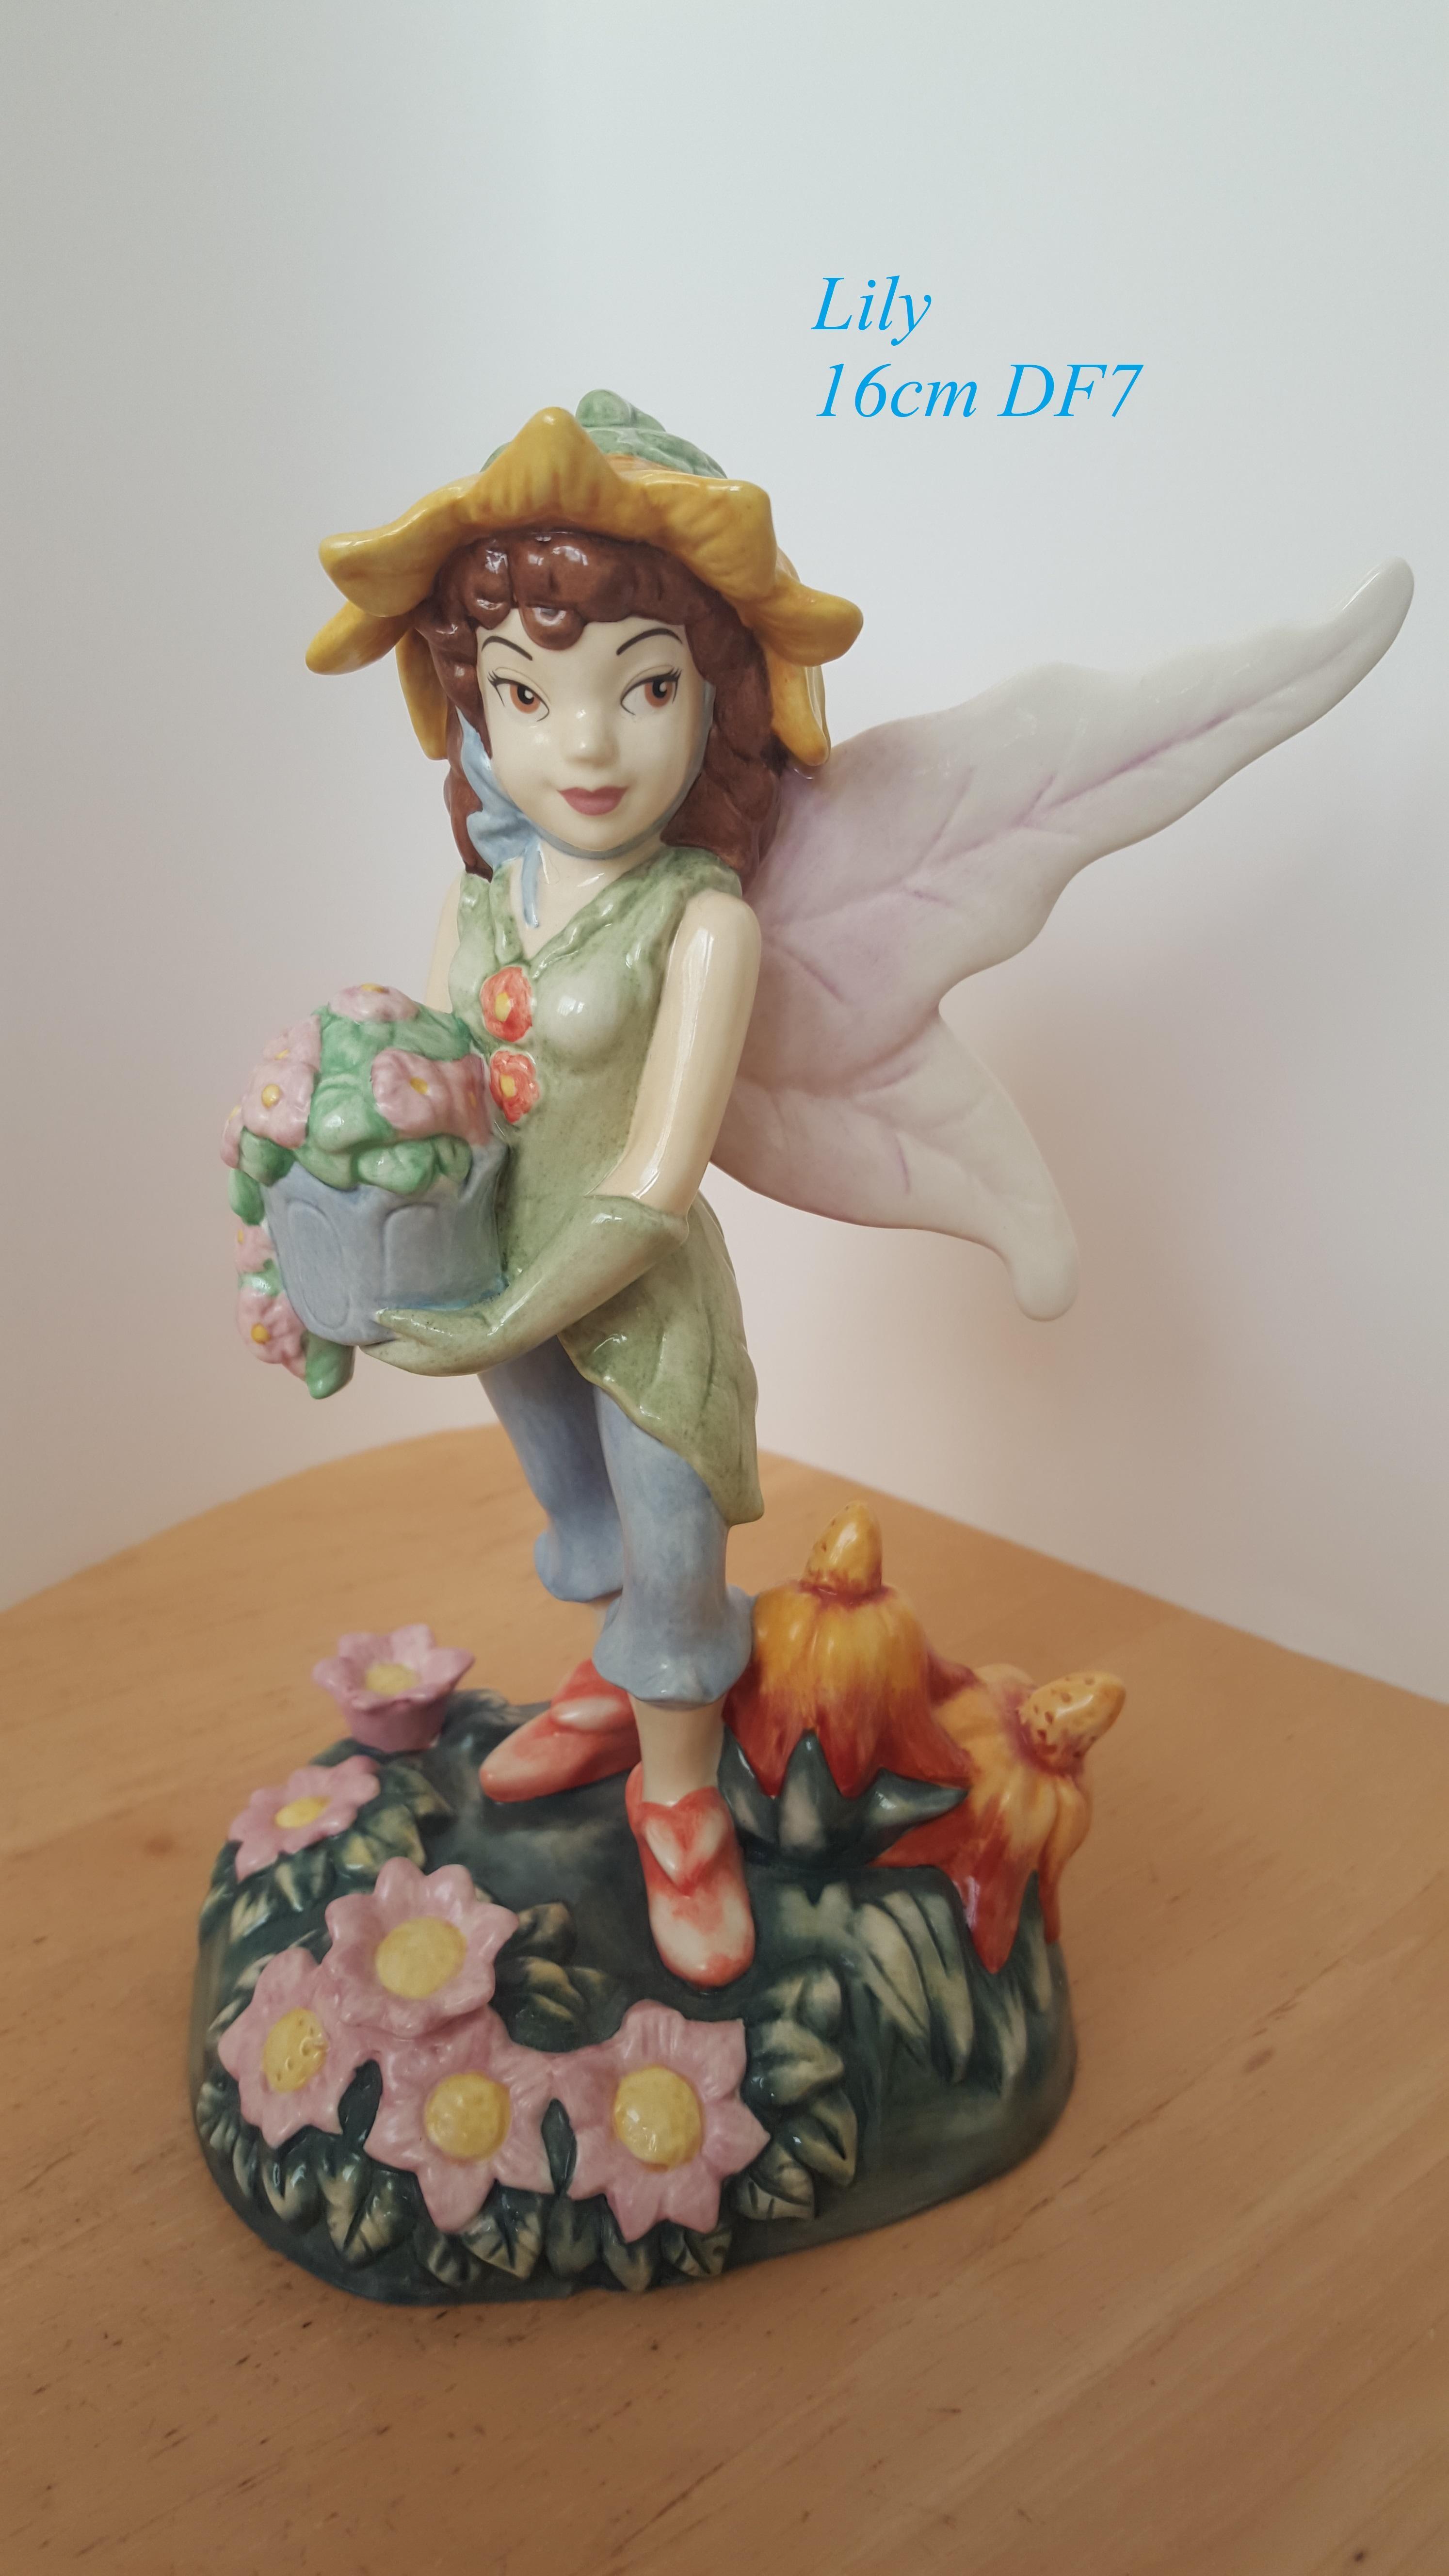 ROYAL DOULTON Disney Fairies Collection Figurine Lily 16cm